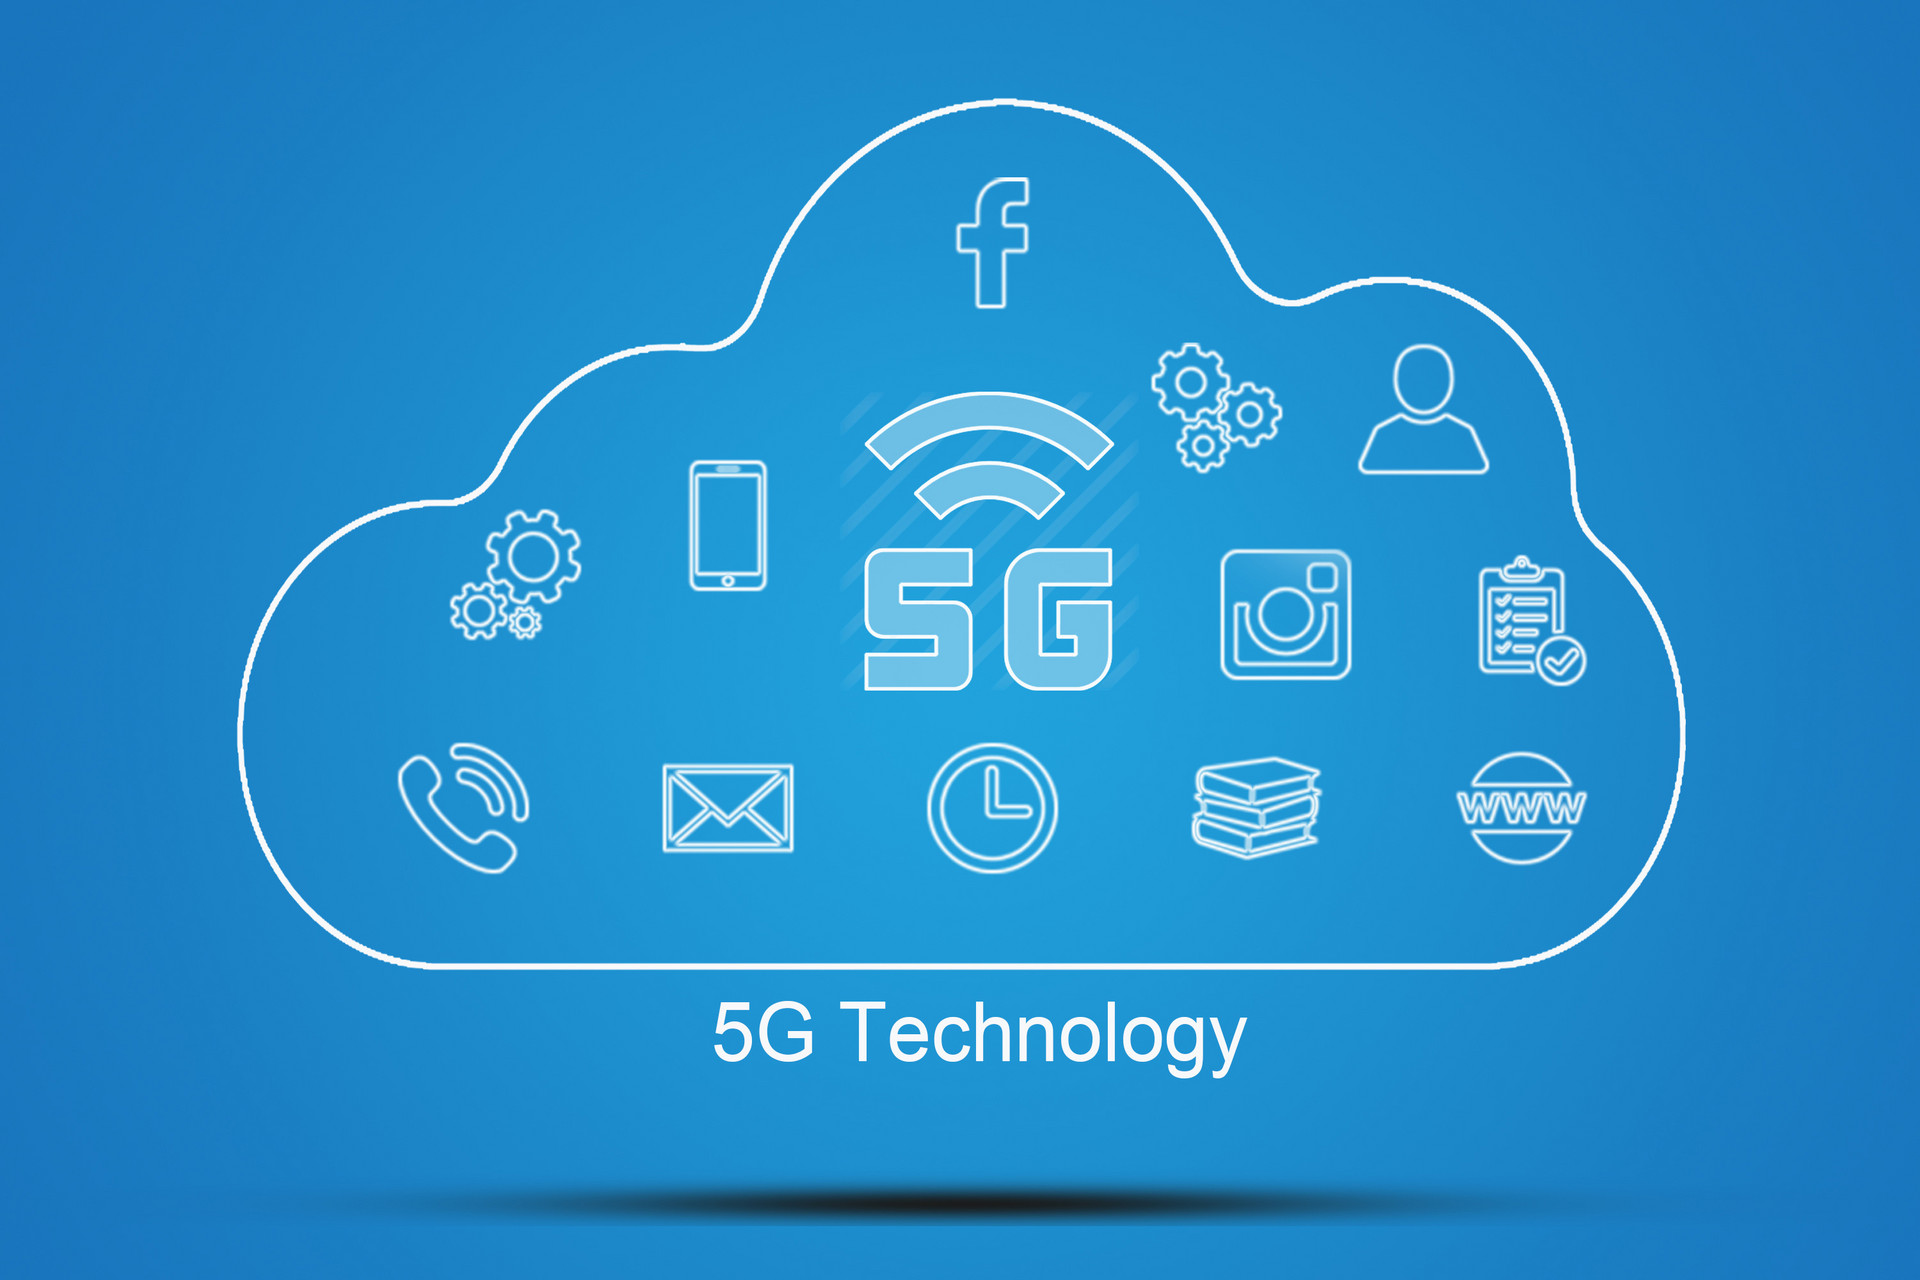 Gartner预测2020年全球5G网络设备收入将达到42亿美元